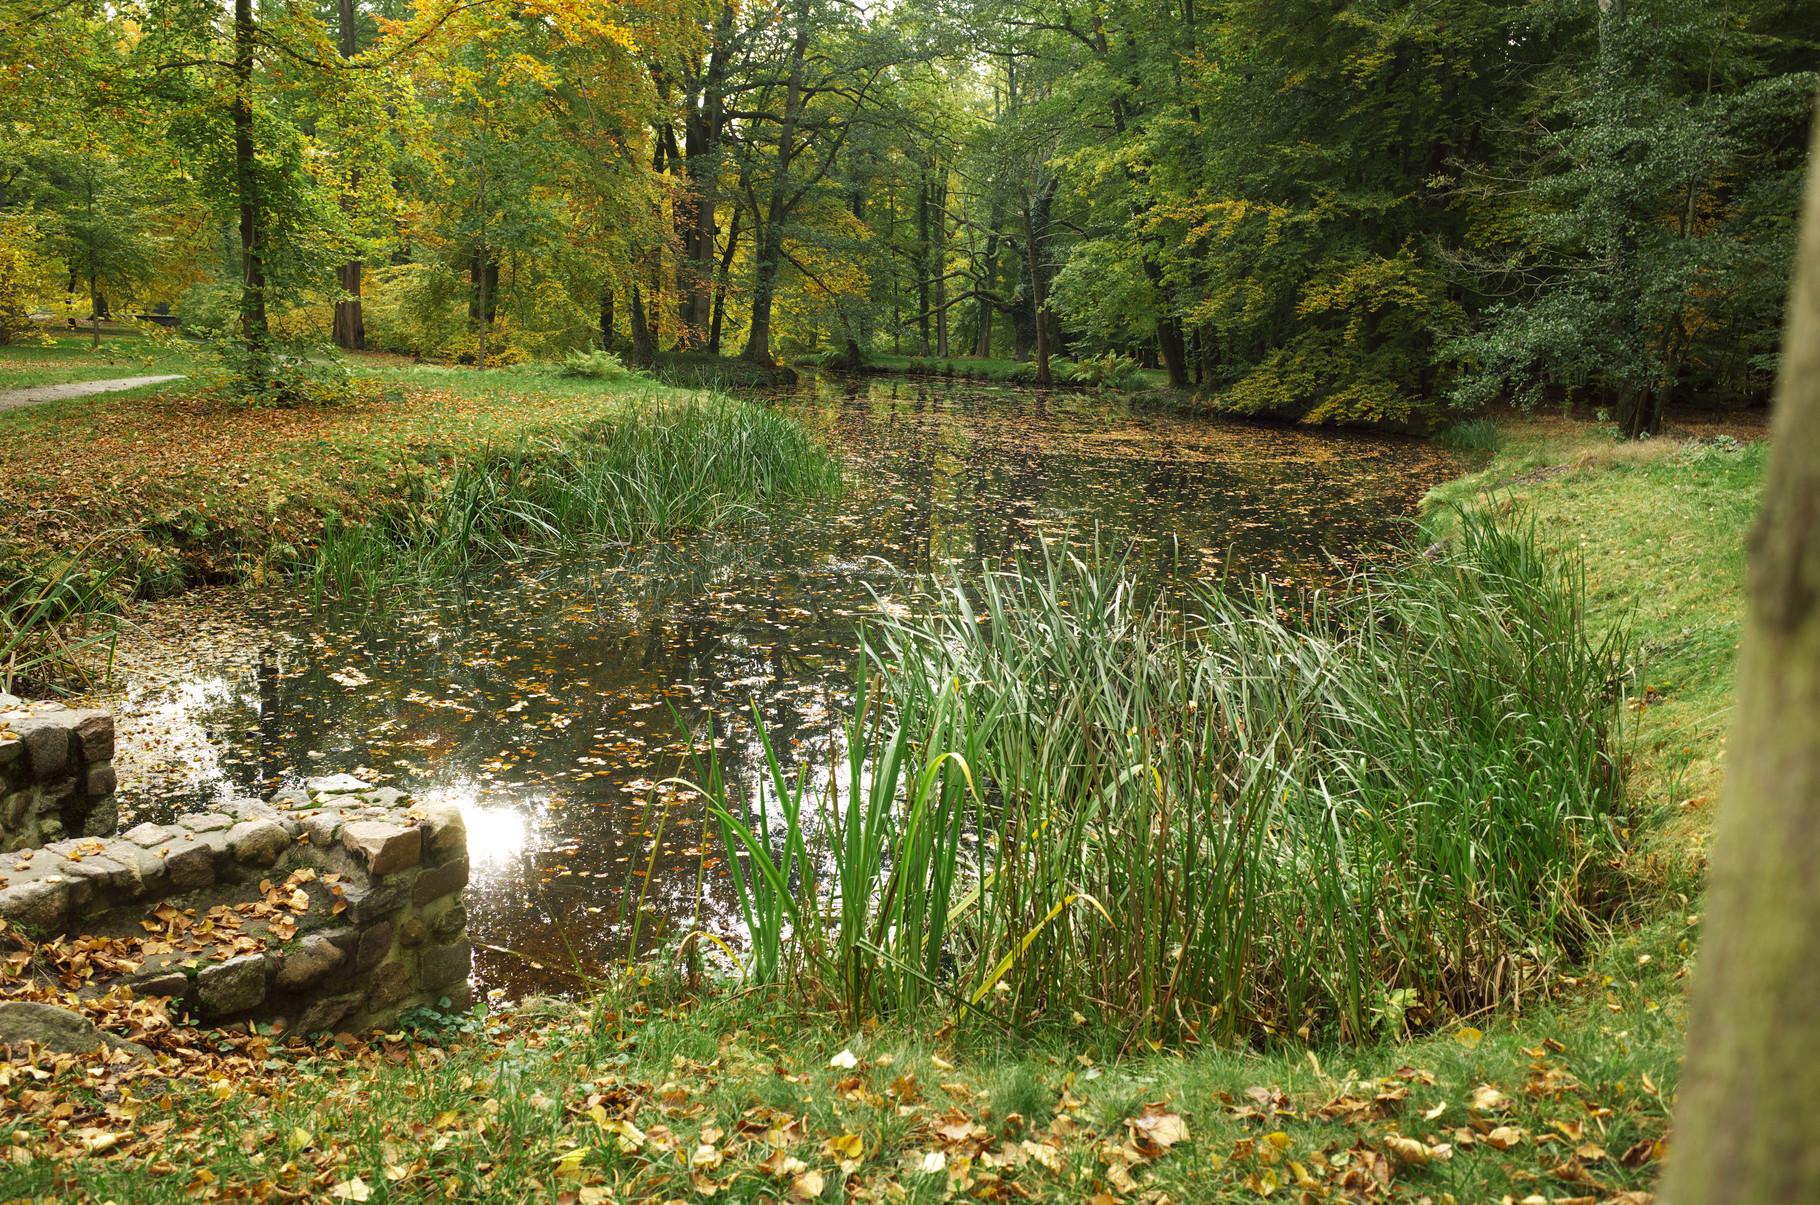 Schlosspark Ludwigslust am 21.10.2015